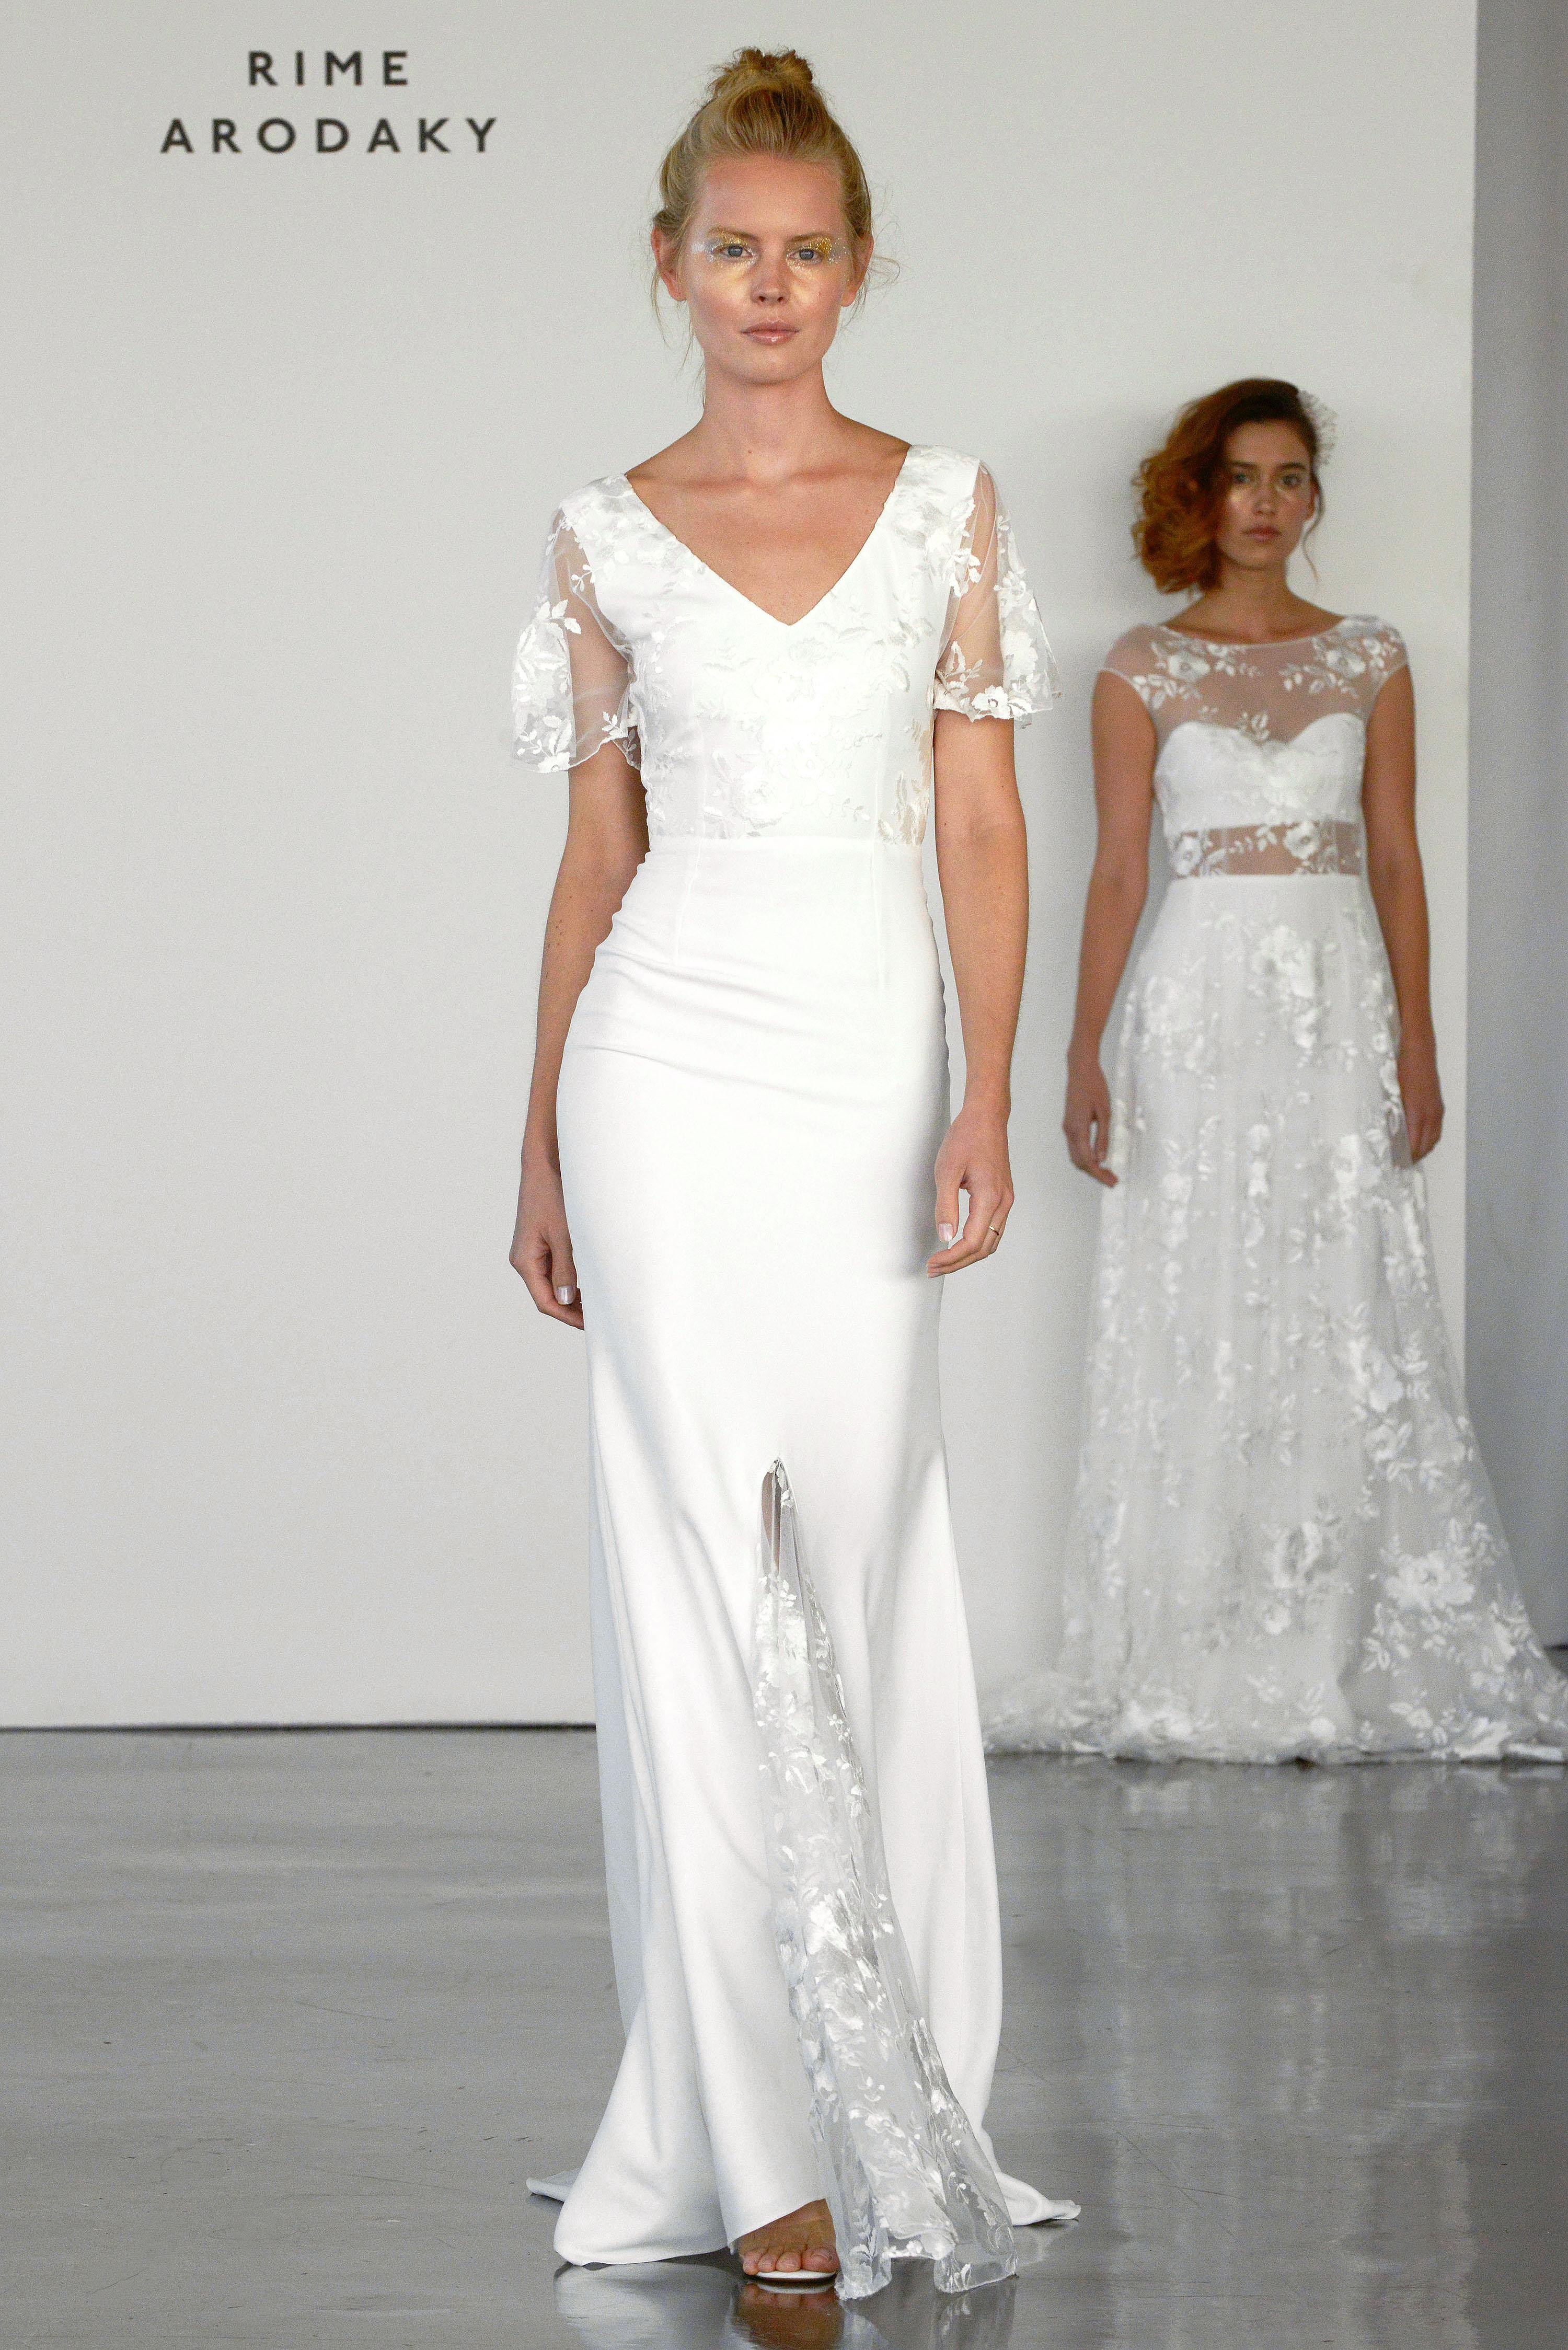 Rime Arodaky wedding dress 24 Fall 2017